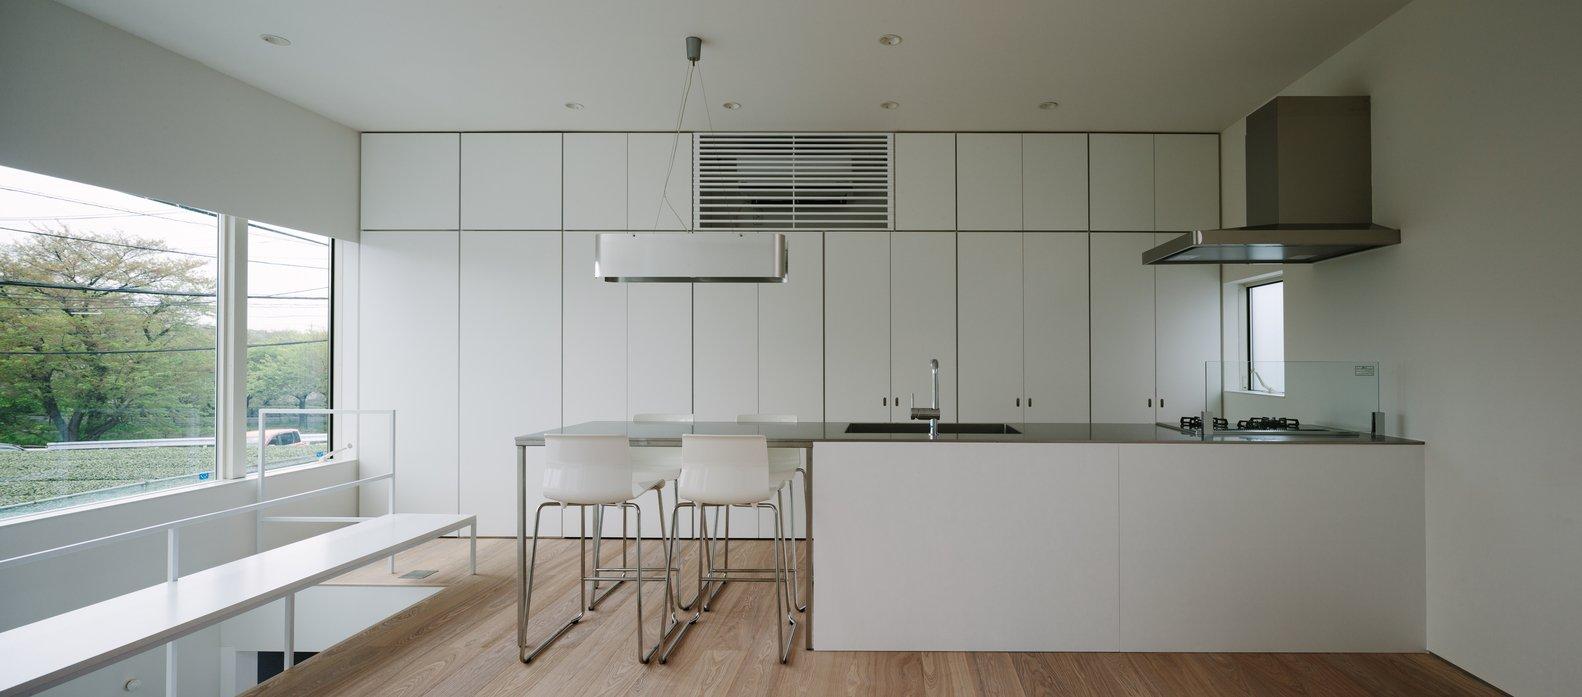 Kitchen, Granite, White, Light Hardwood, Recessed, Range Hood, and Range  Best Kitchen Light Hardwood Granite Photos from Vida